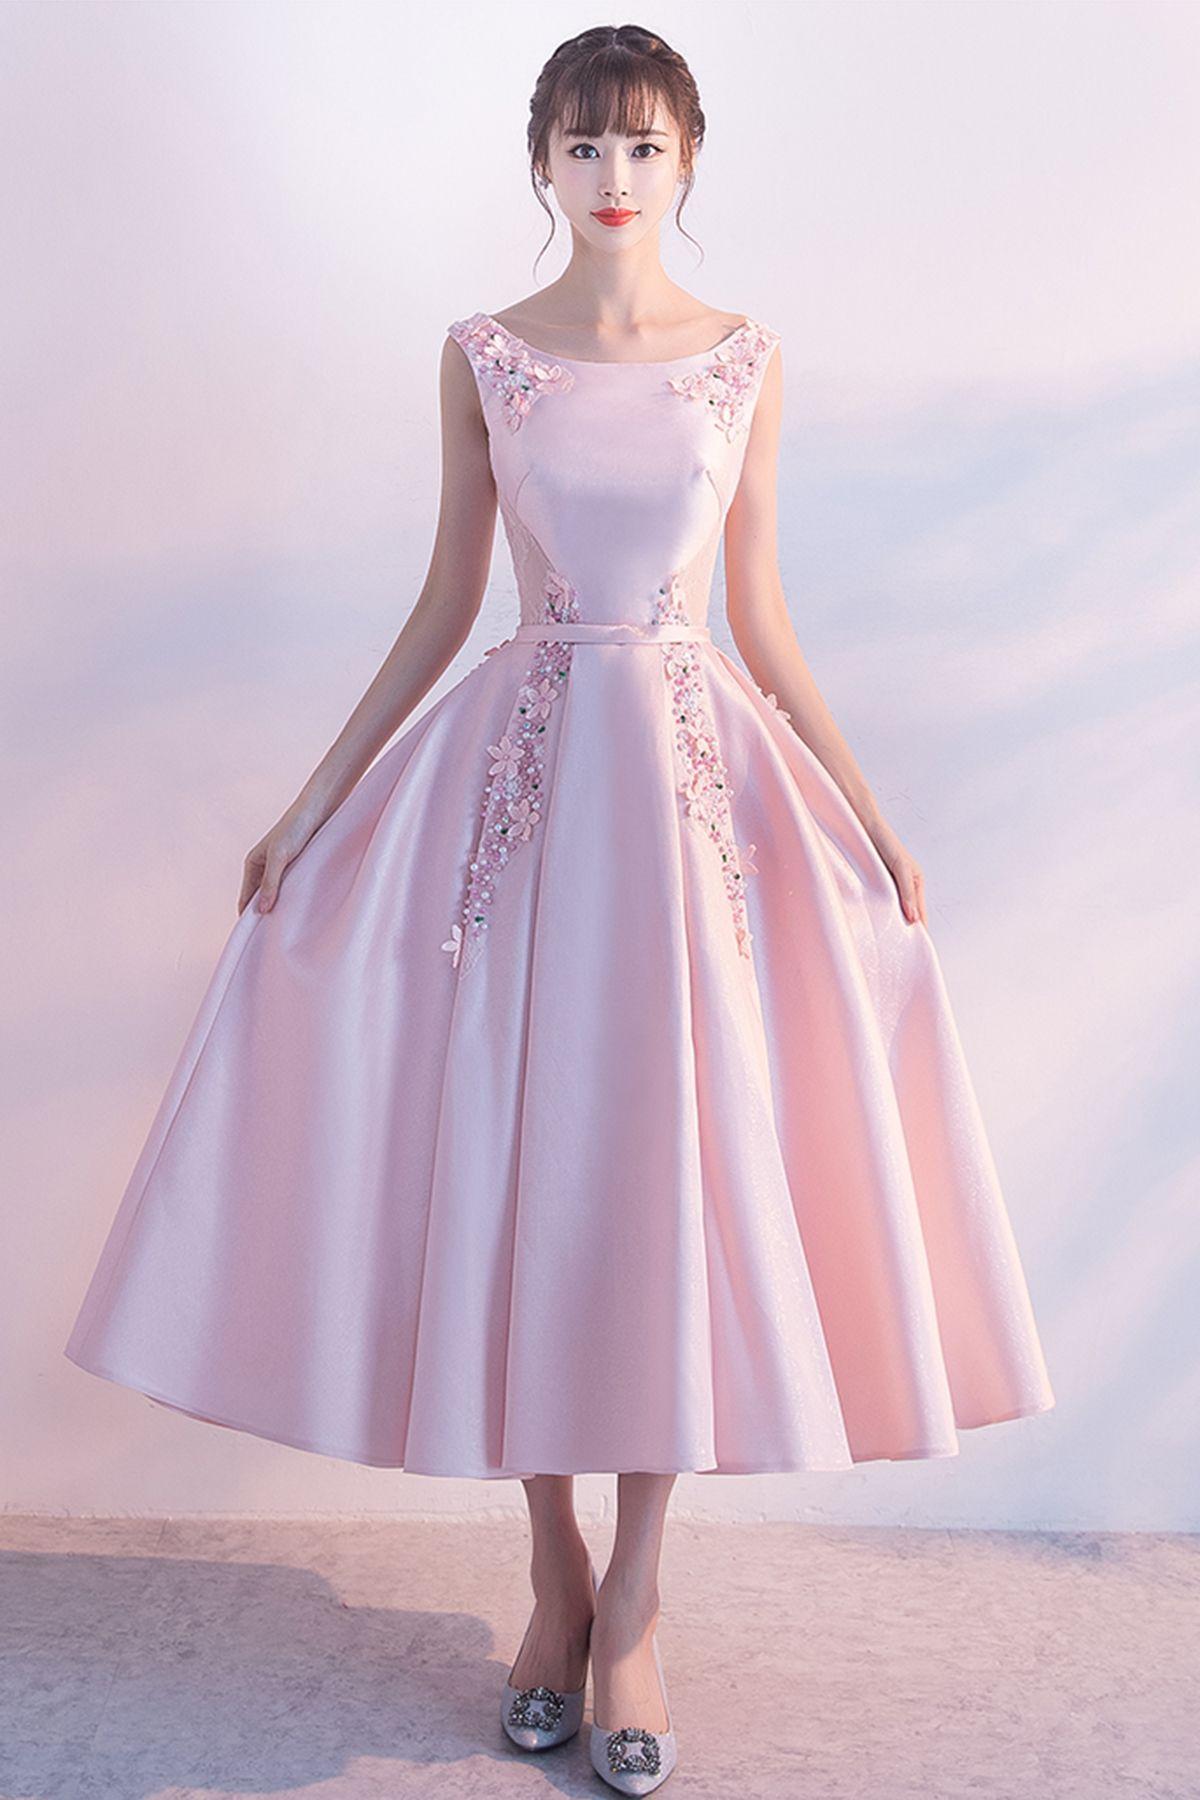 5b0e7f4f530 Elegant pink satin mid length bridesmaid dress